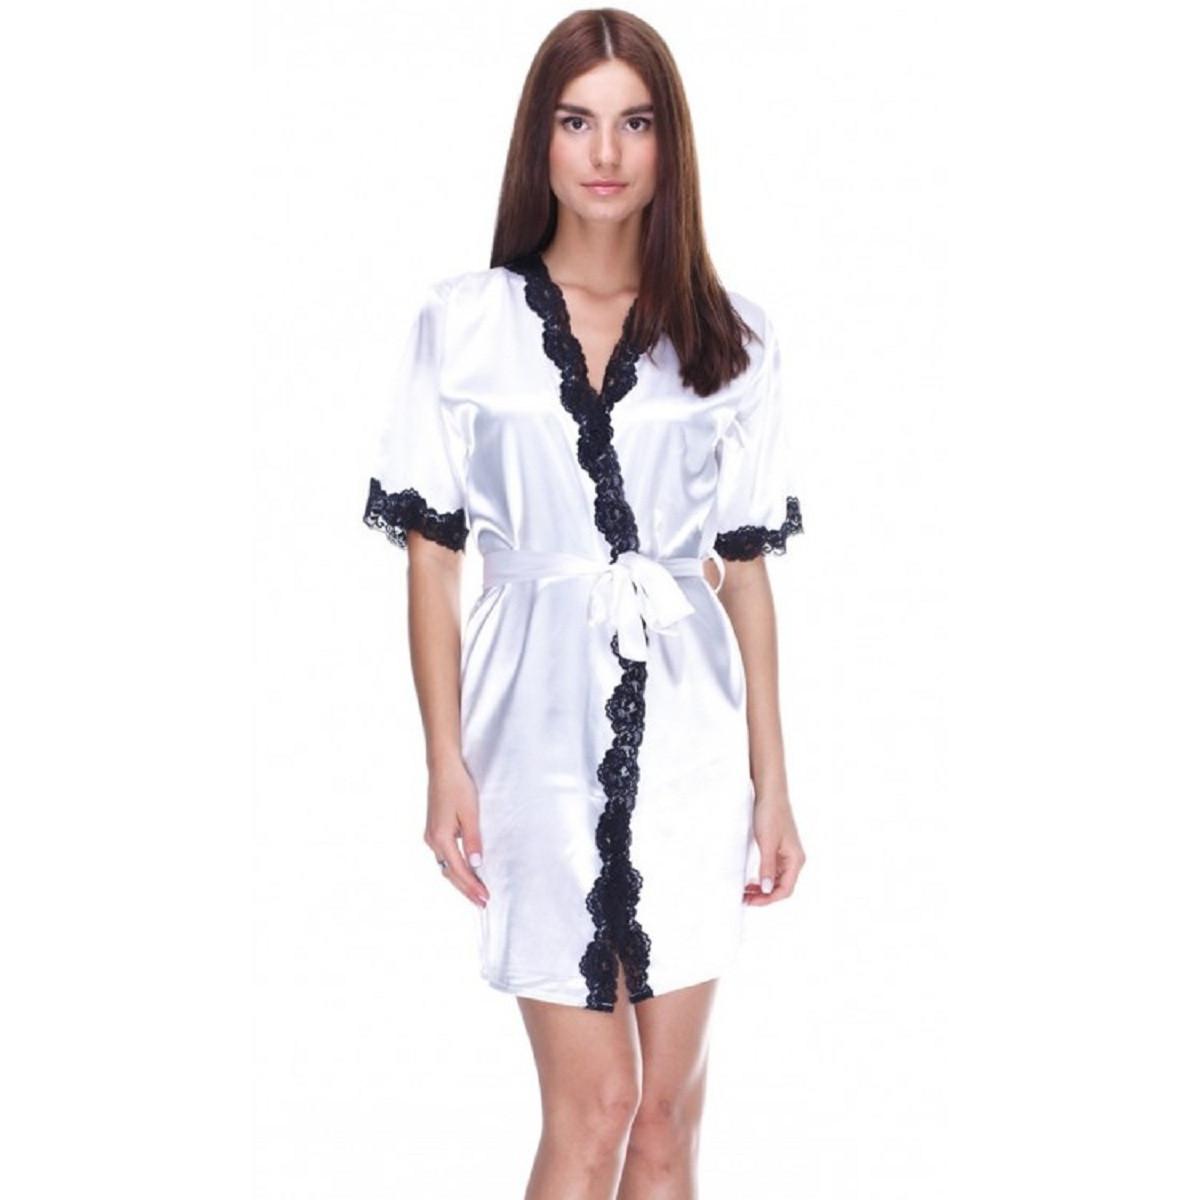 78acd9e06a06d6e Шелковый халат Serenade, арт. 101, экри-черный: продажа, цена в ...